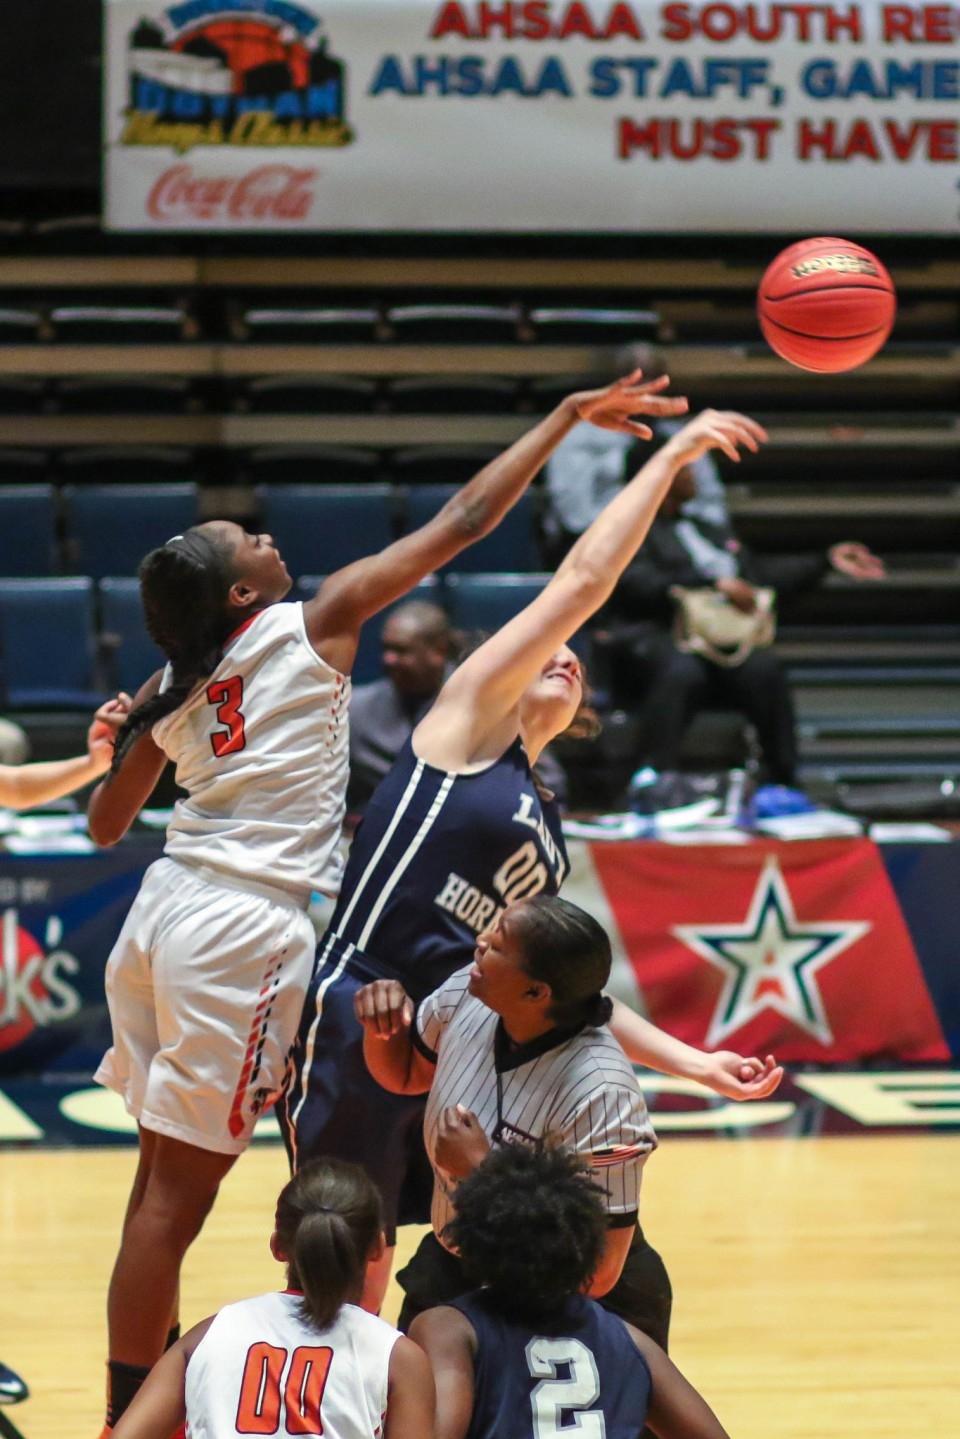 womensbasketball7.jpg